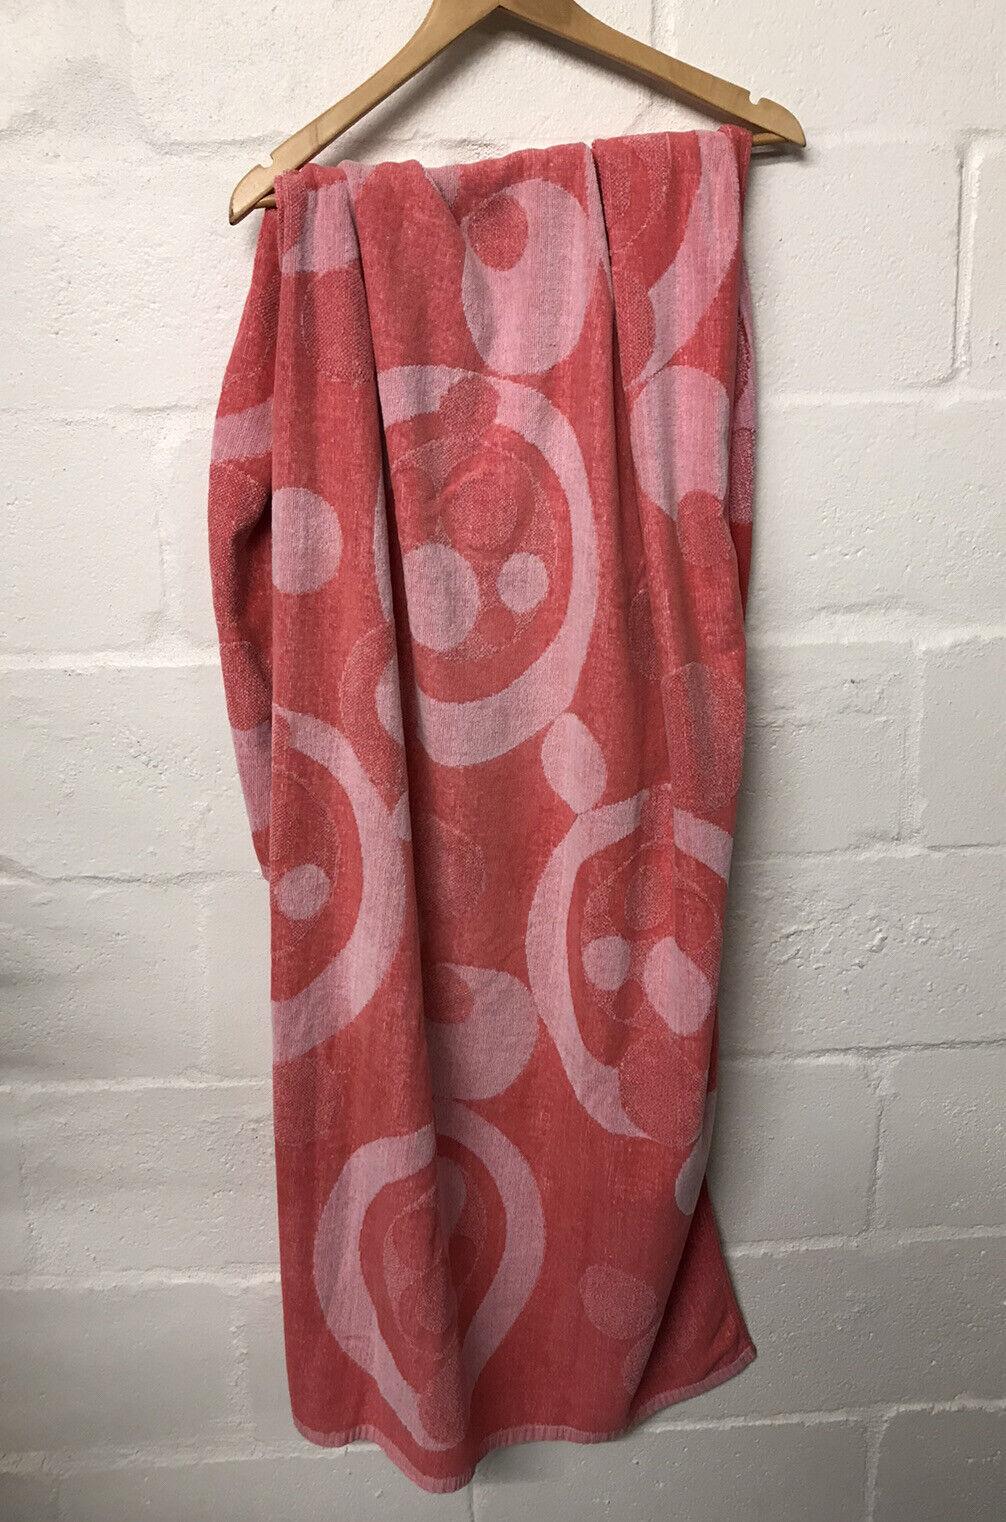 Vintage Sea King Beach Towel - Town House Pink Cotton Polkadot